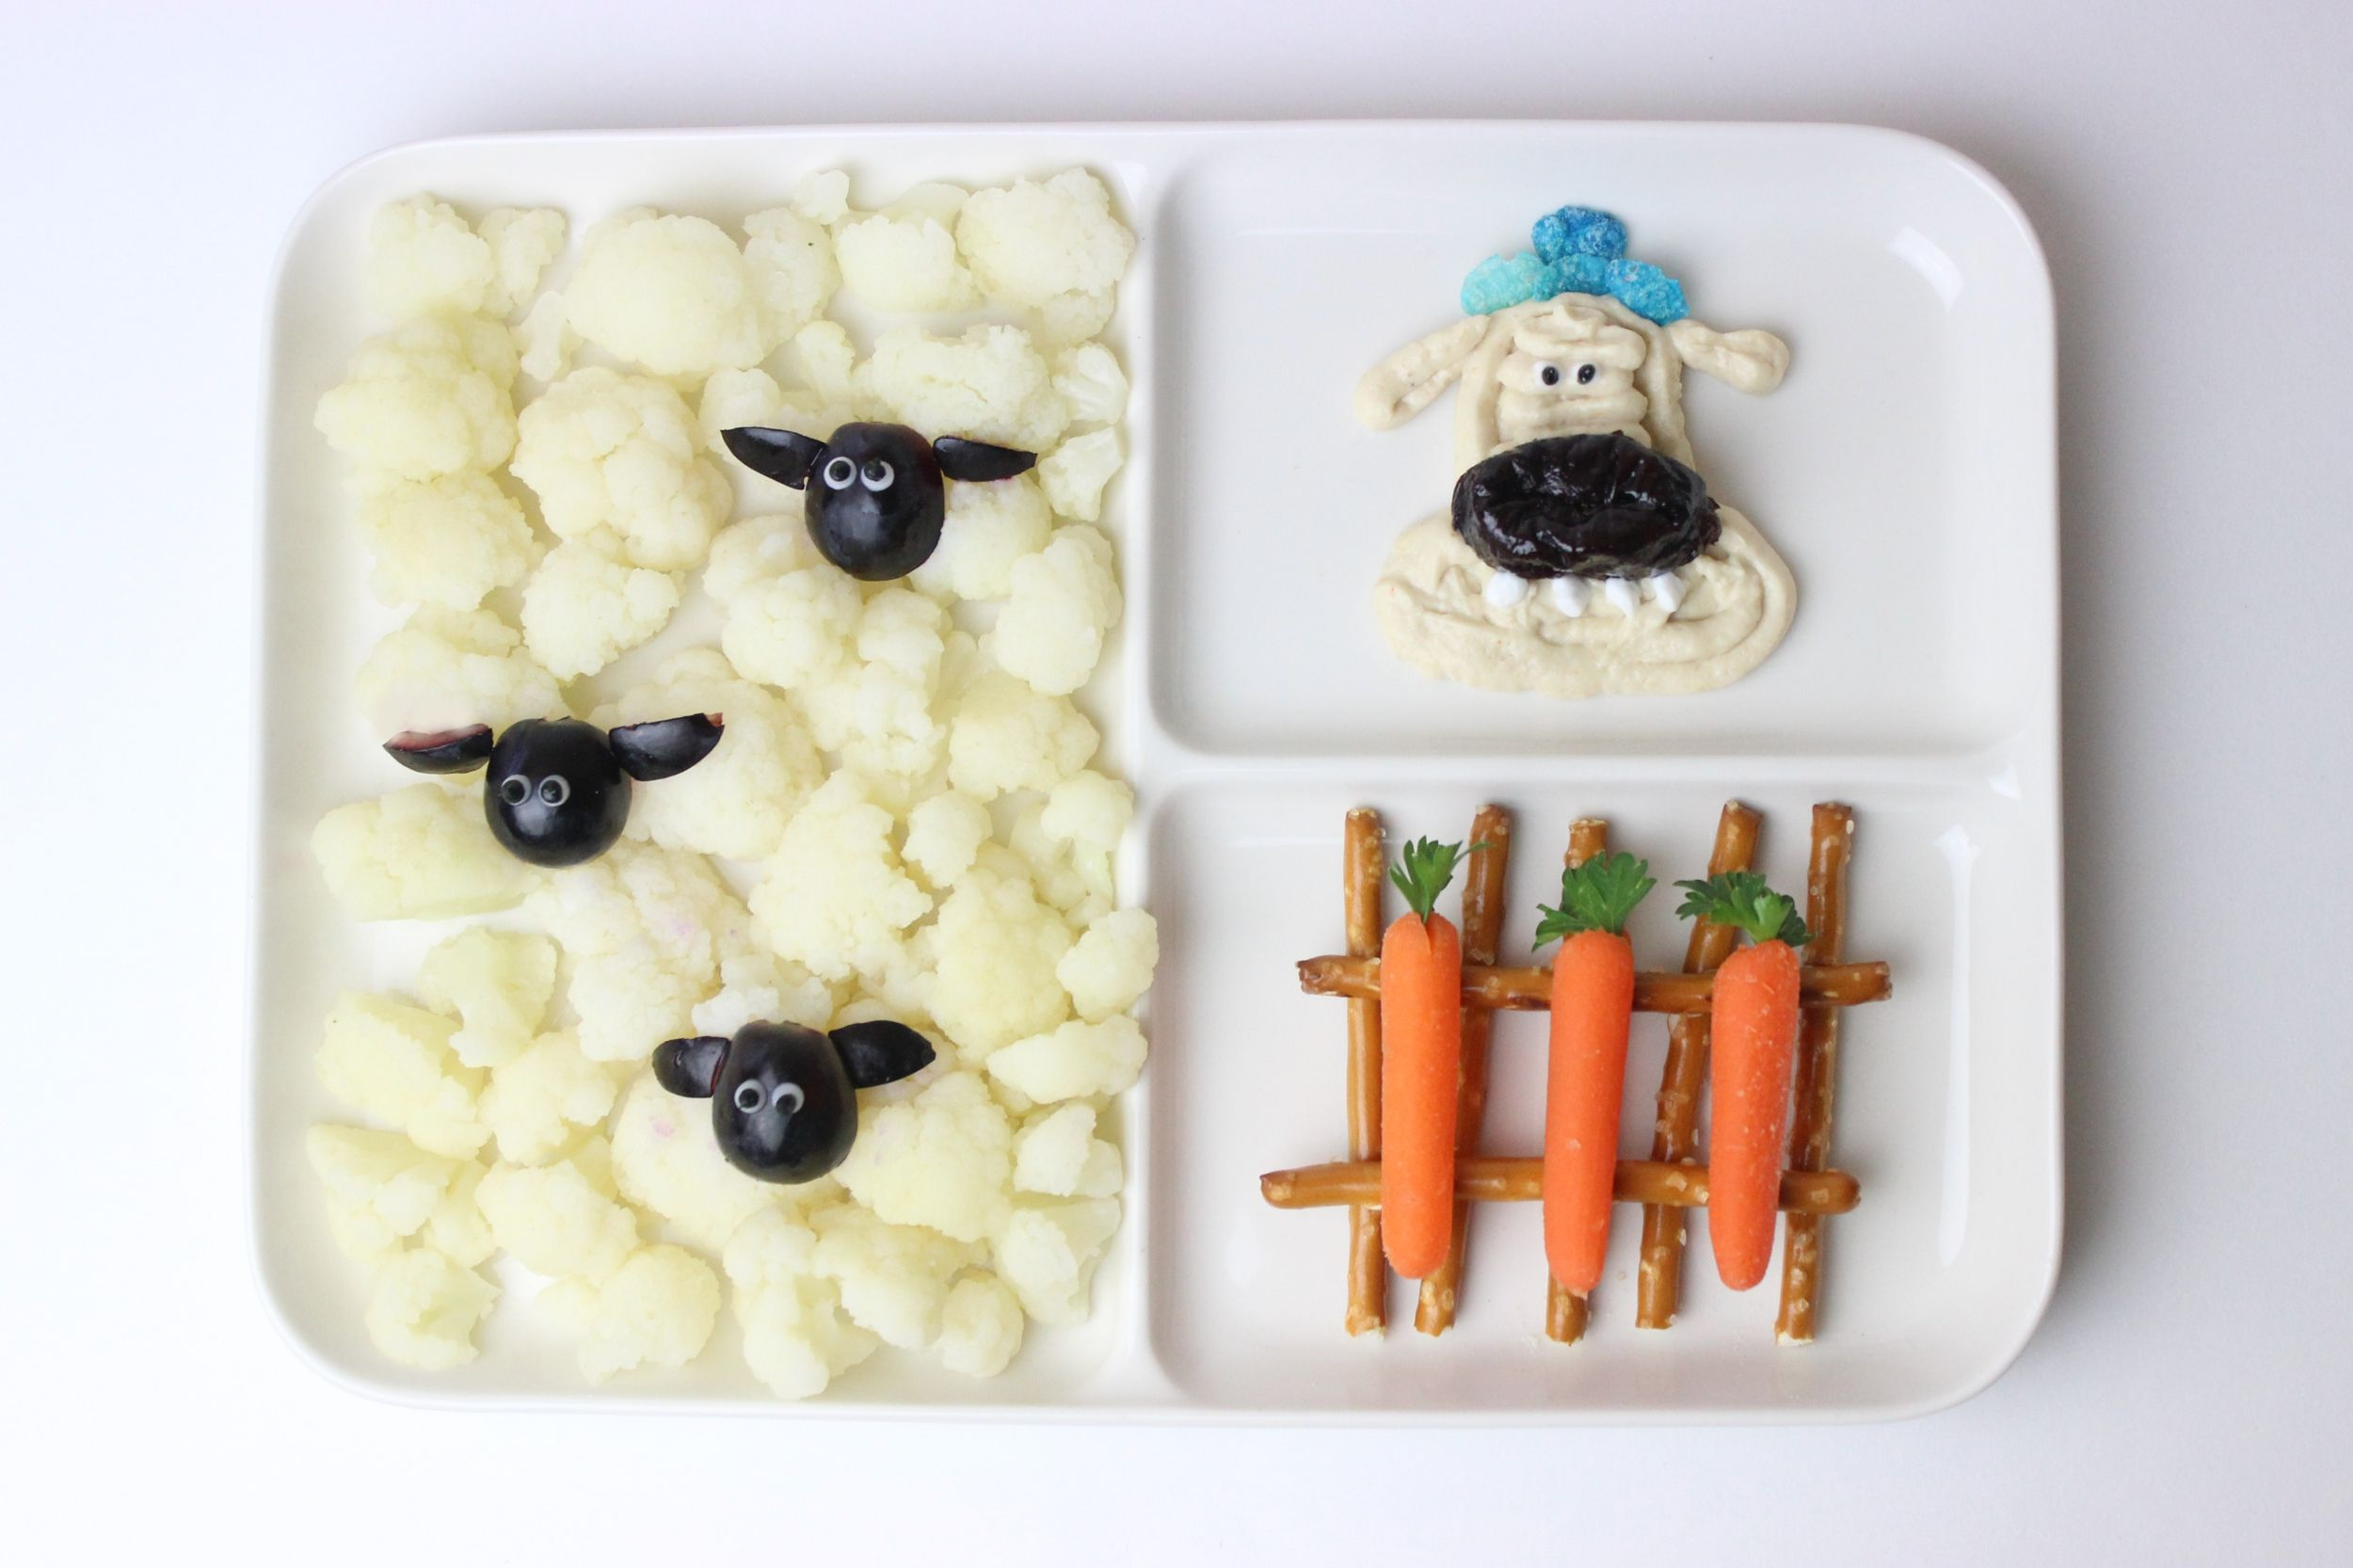 Shaun the Sheep snack